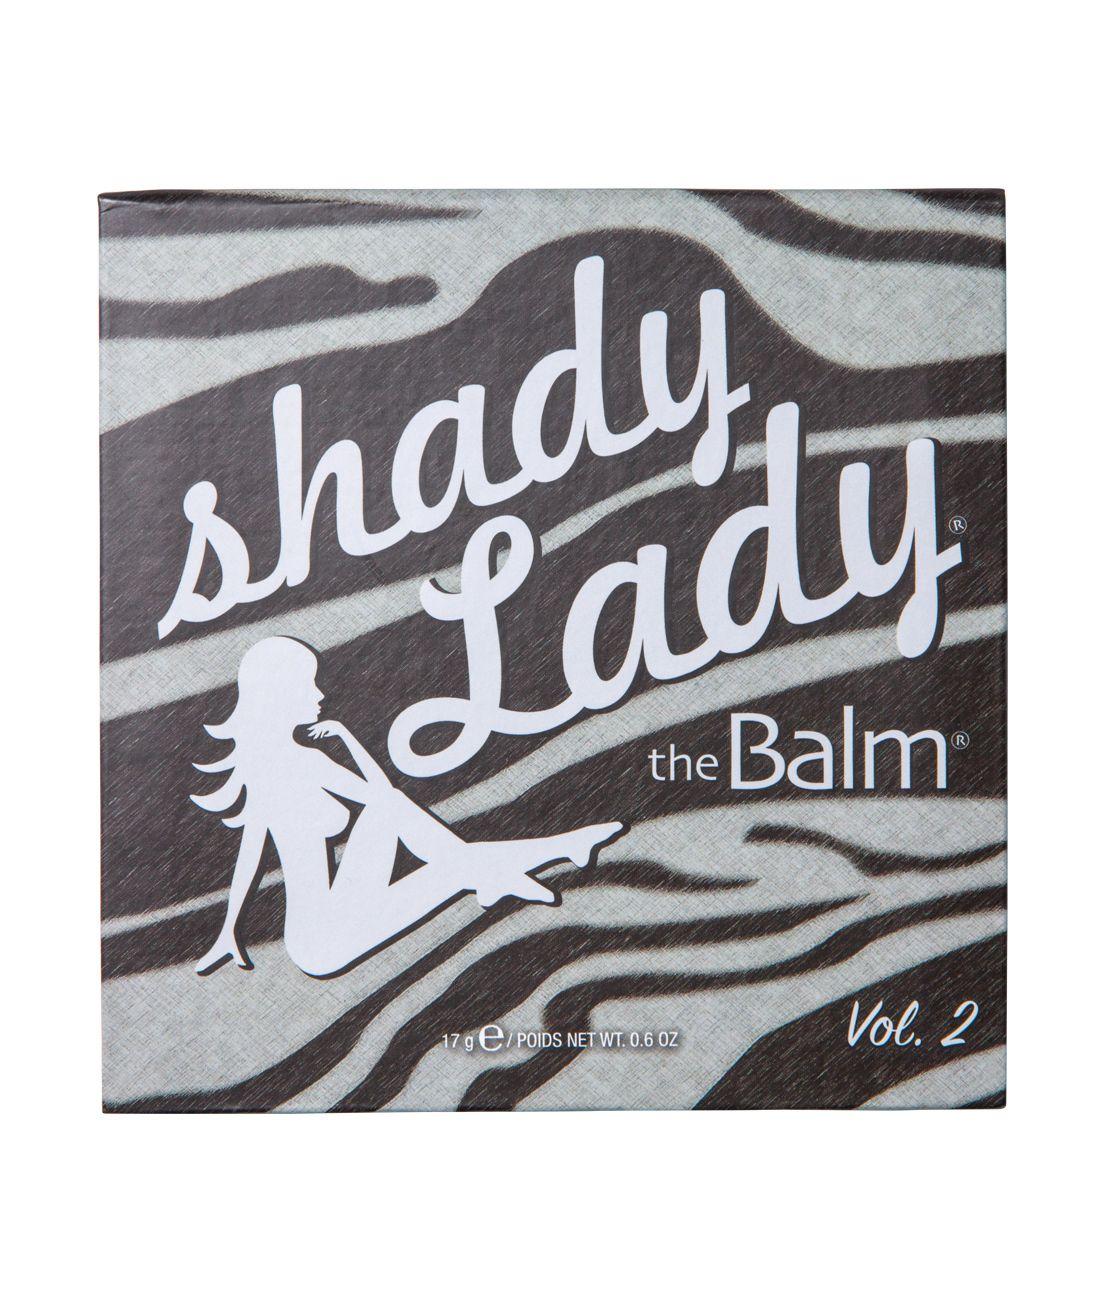 Shady Lady palette